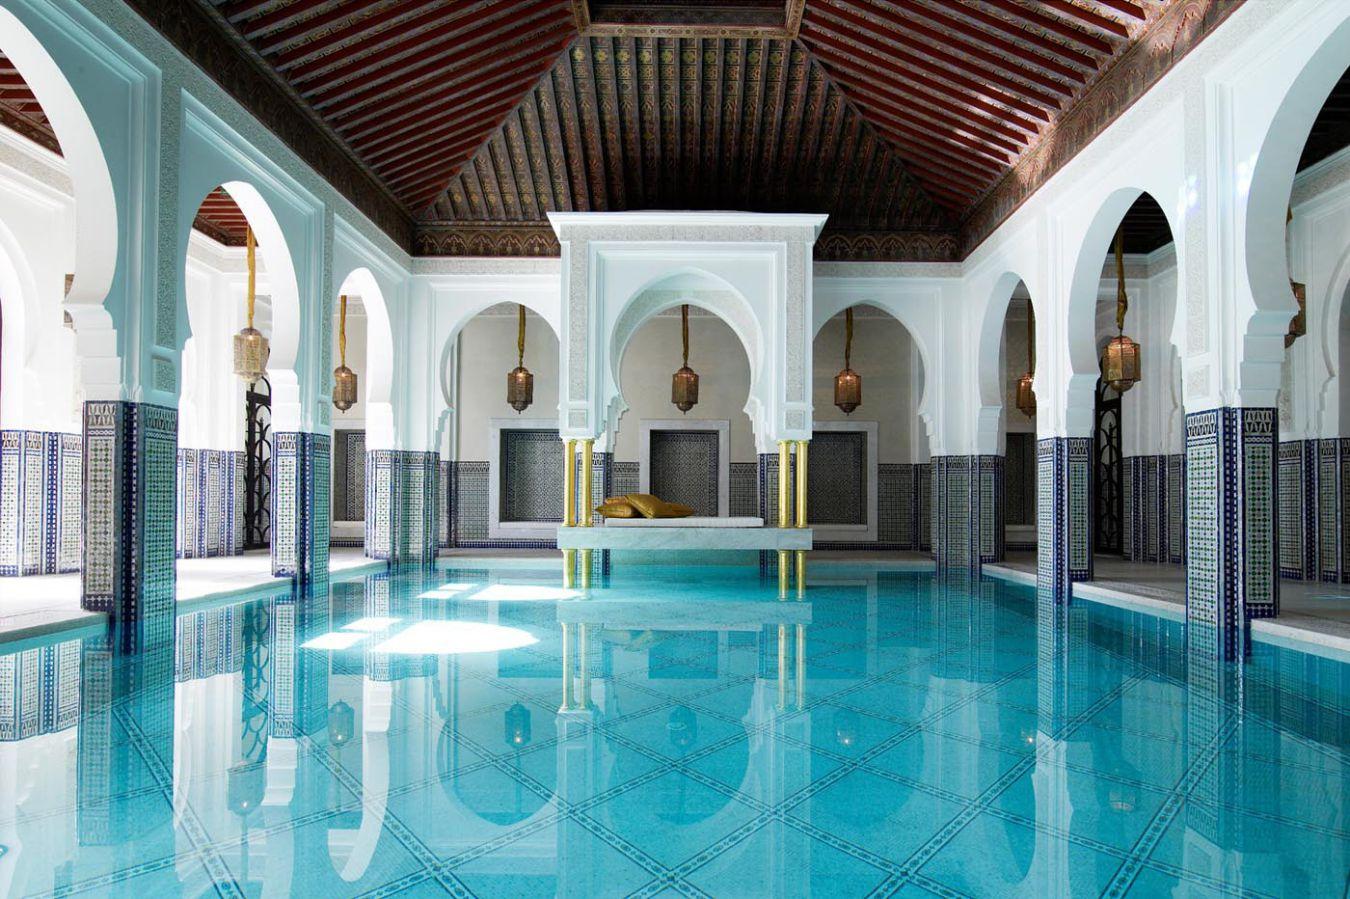 @exotiktraveler's cover photo for 'La Mamounia, a legendary palace - EXOTIKTRAVELER'